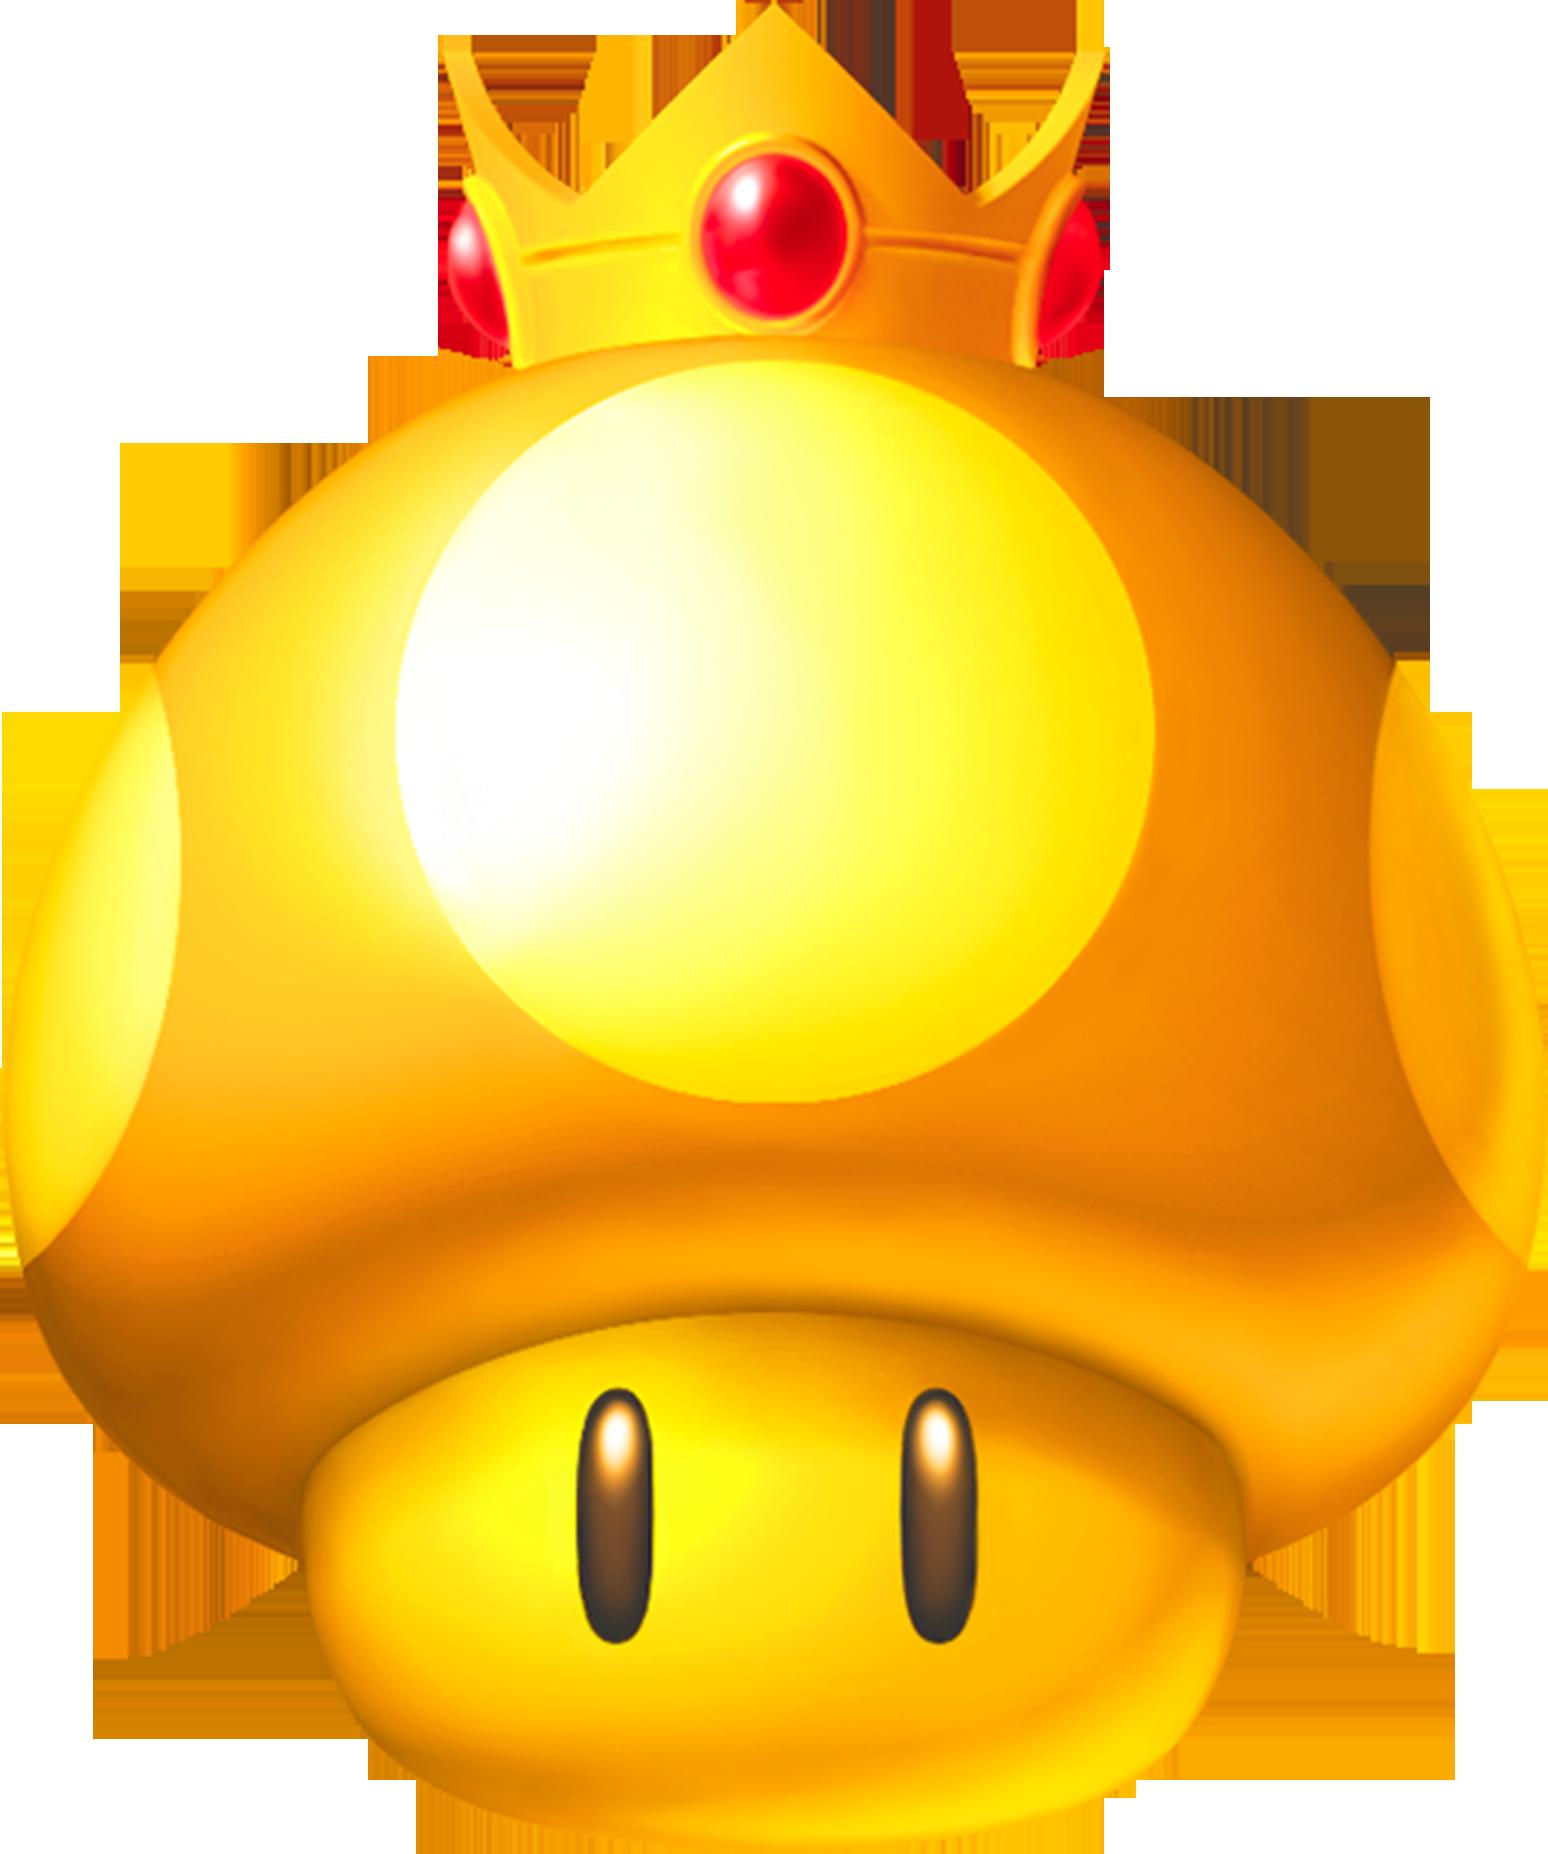 Mario star clipart png jpg transparent stock User blog:HammerBro101/Top 10 WORST Mario Kart Items! | Mario Kart ... jpg transparent stock